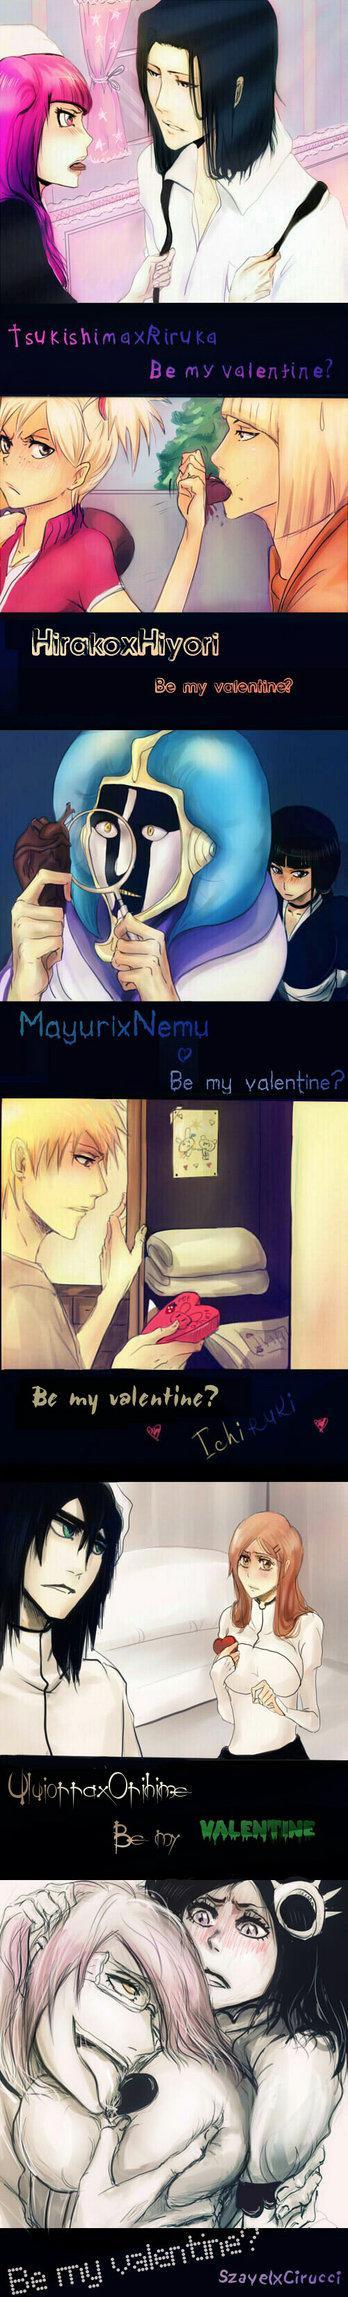 Autors: Hueco Mundo Bleach - Valentine Edition.